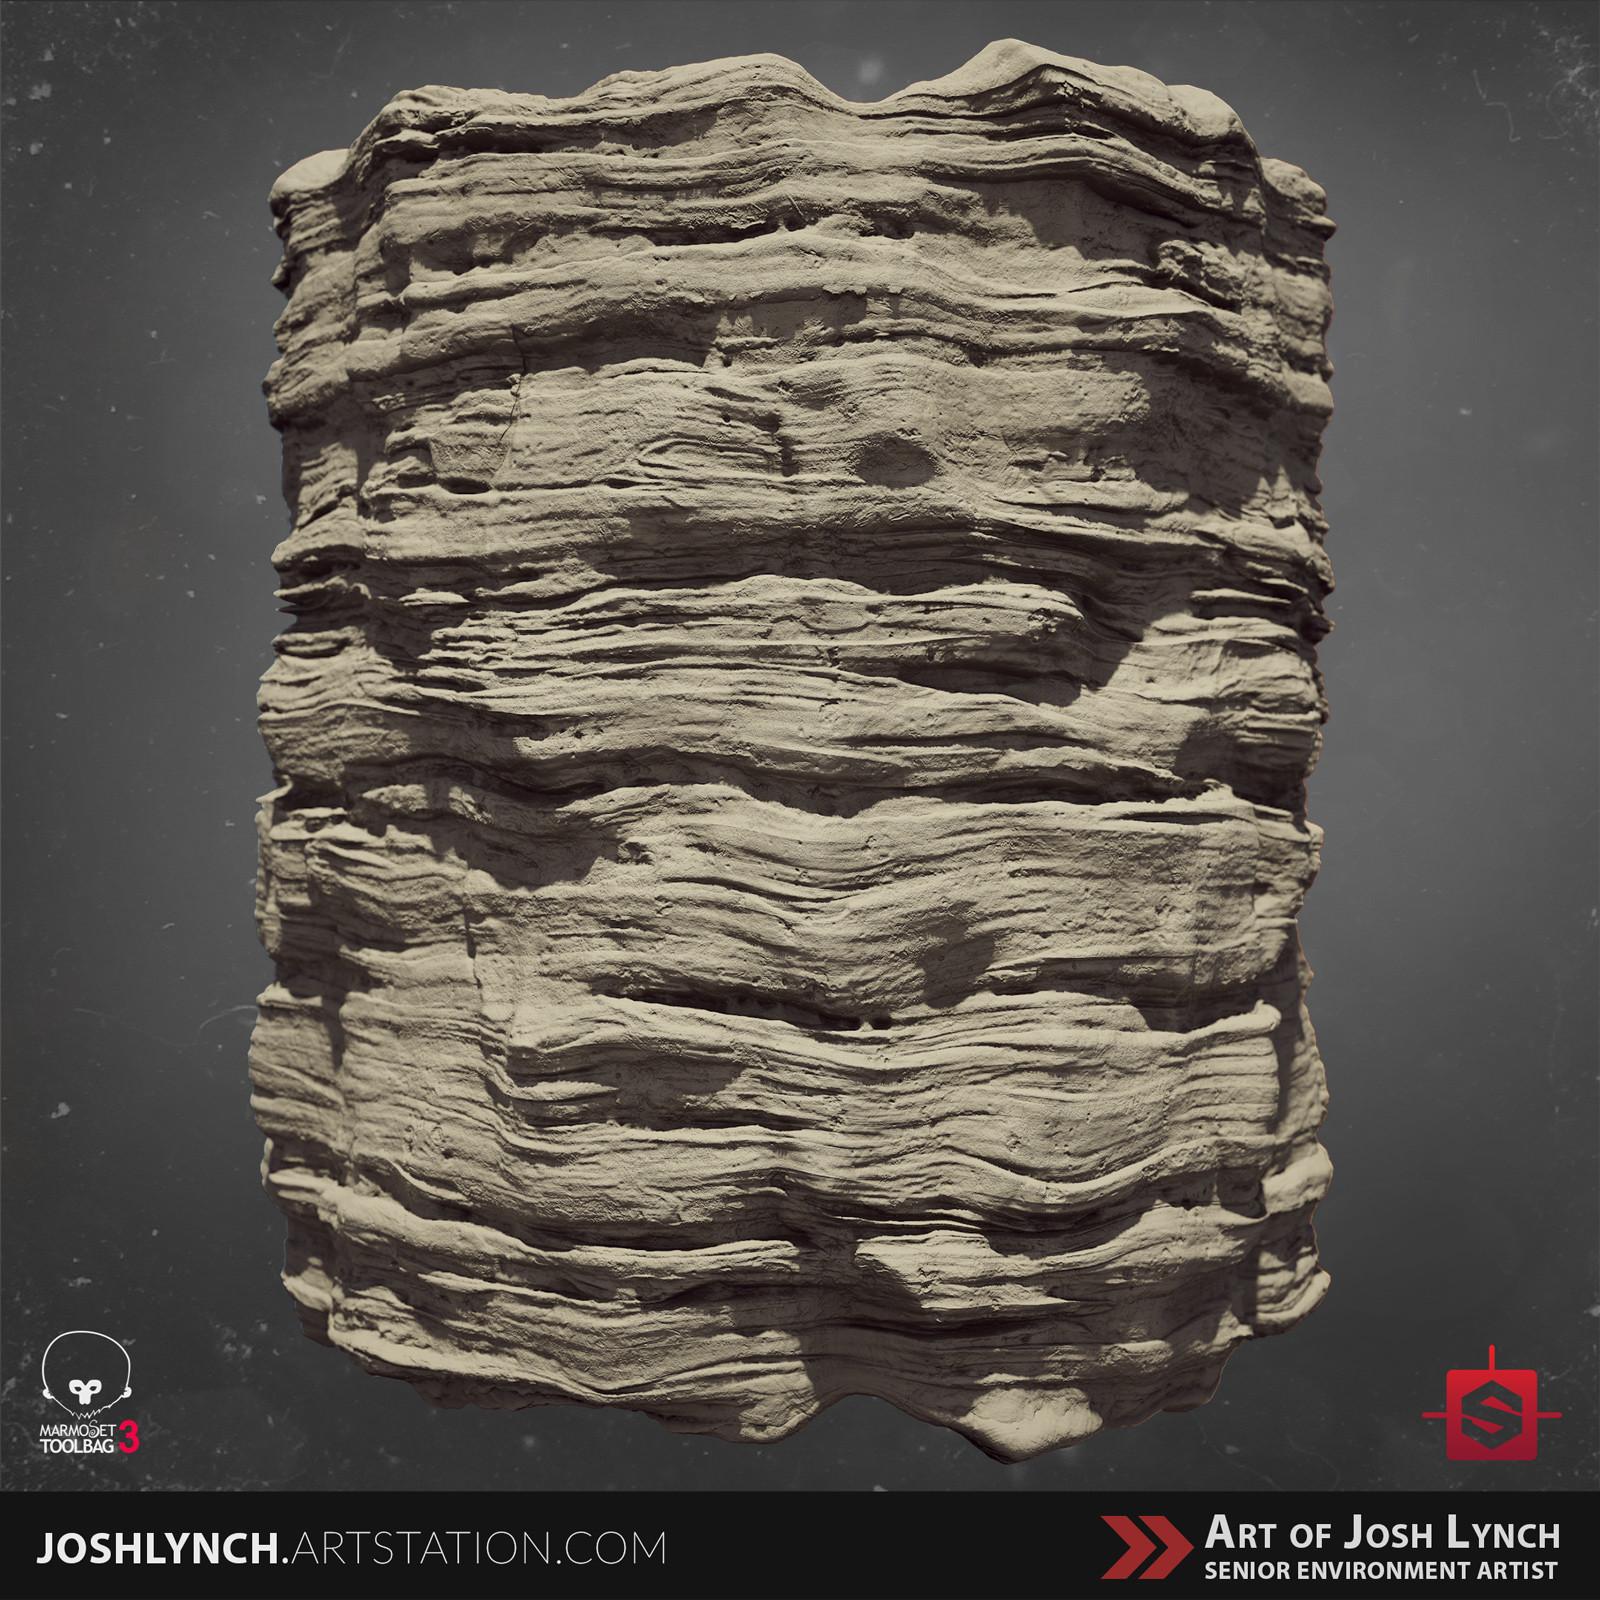 Joshua lynch rock wall 03 layout comp cylinder var 04 gray